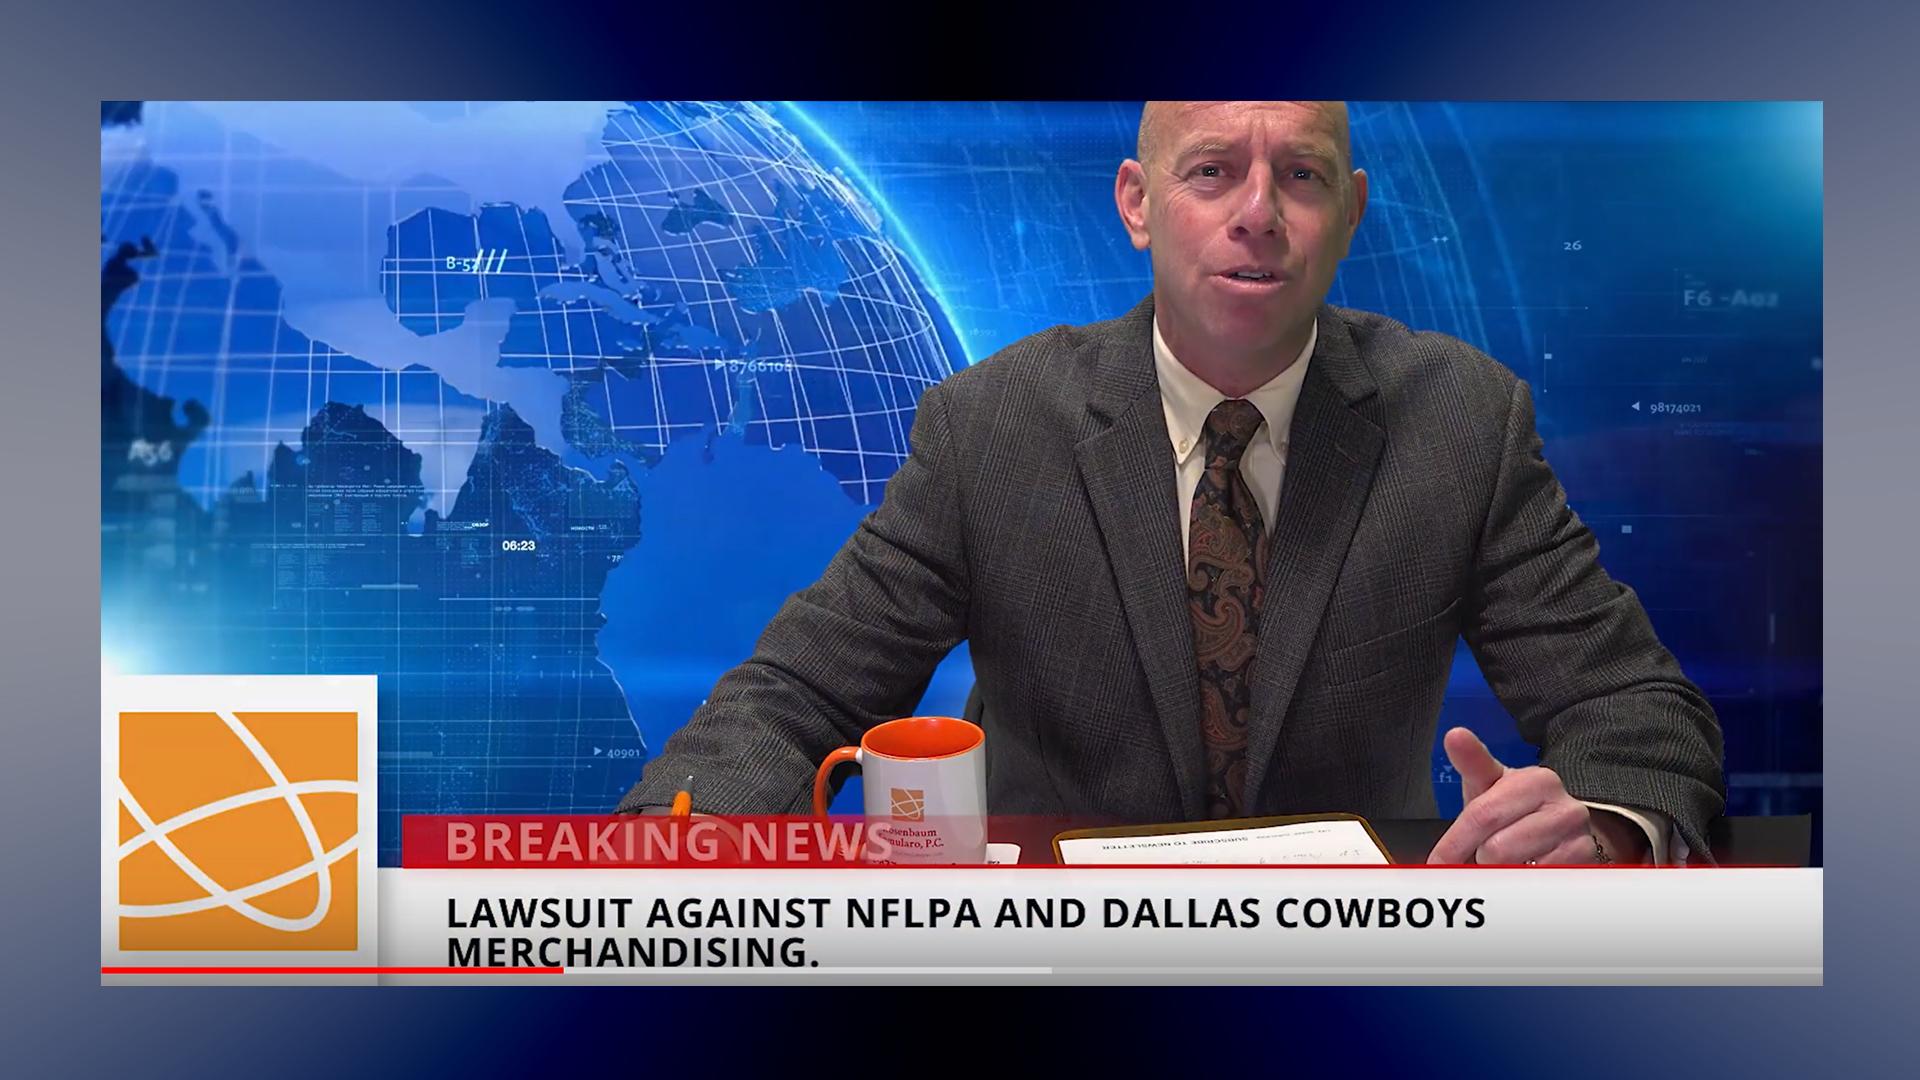 Amazon Sellers' News 12/27/19 - Lawsuit Against NFL PA & Dallas Cowboys Merchandising, IP Complaints & Plan of Action Rejections